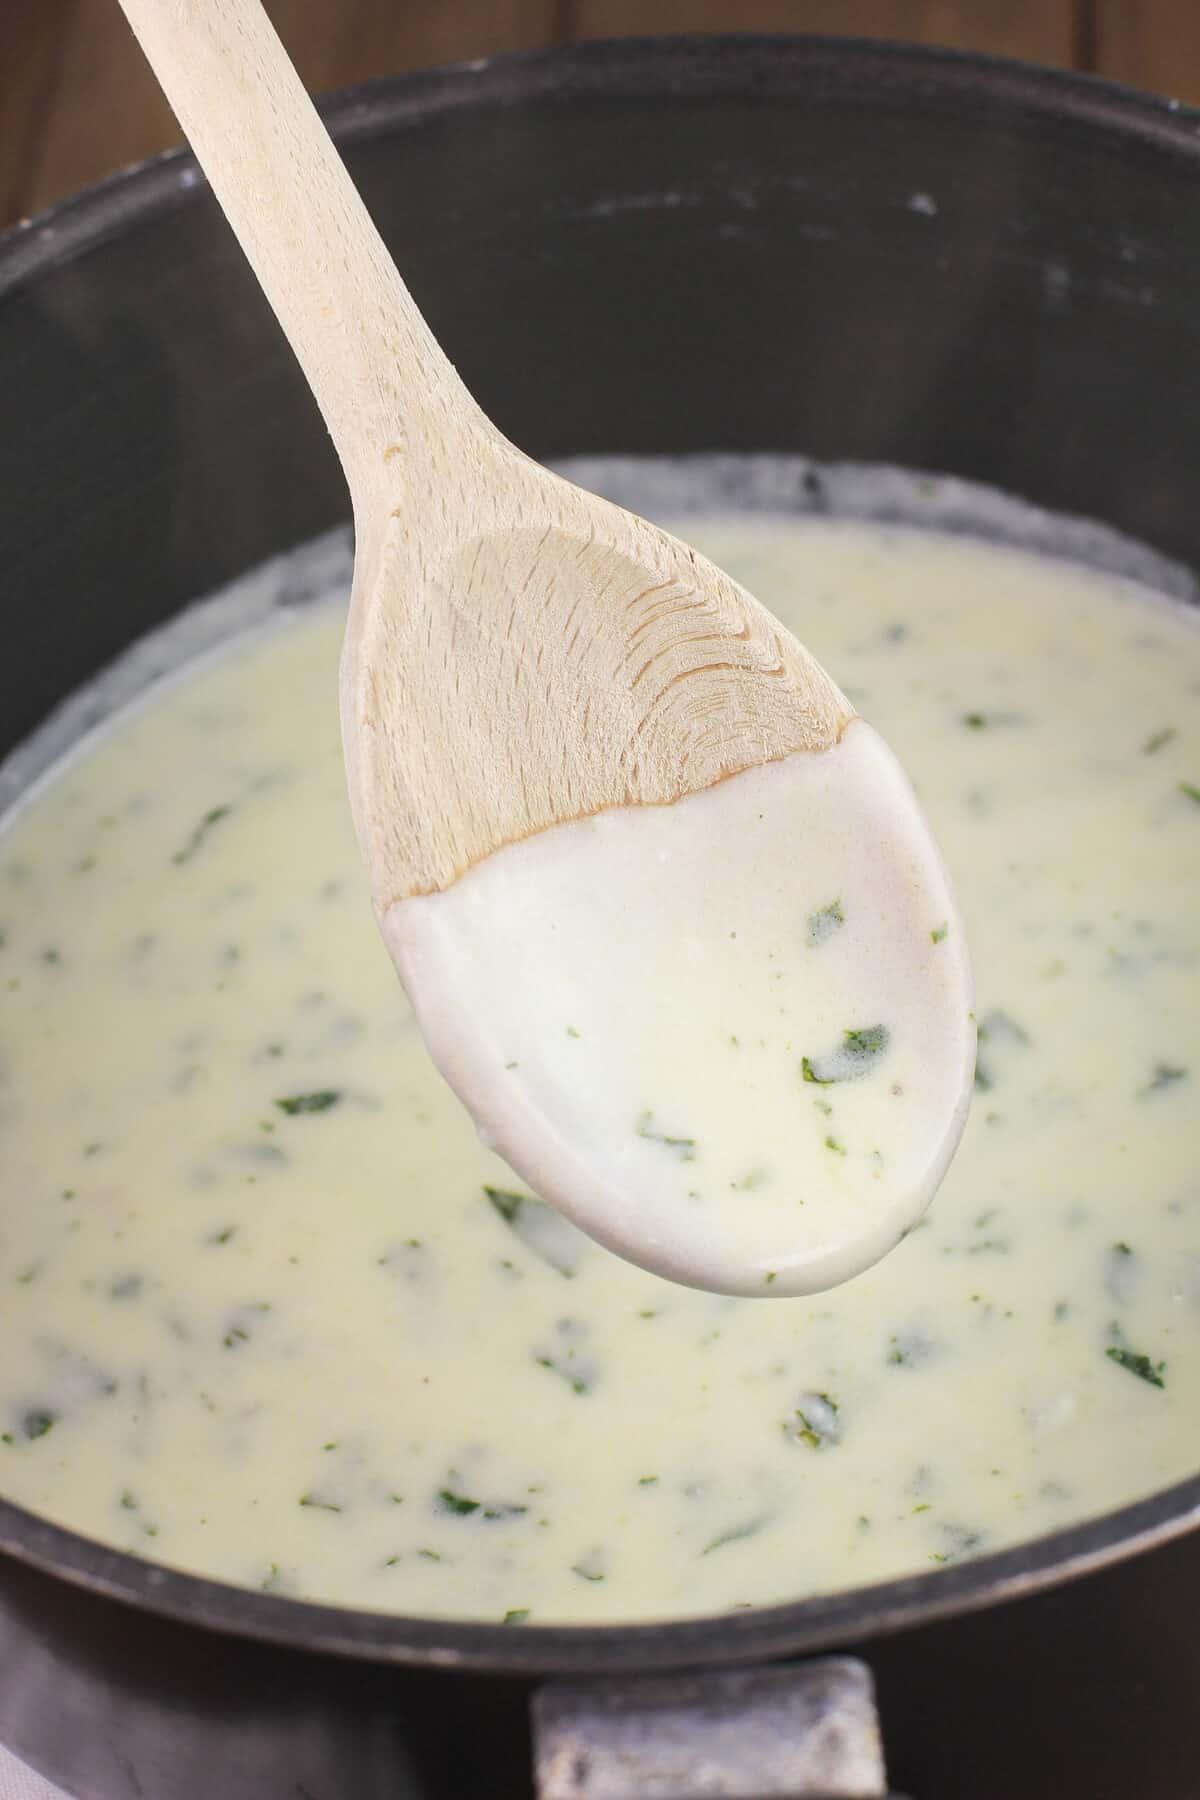 lemon basil cream on wooden spoon in saucepan